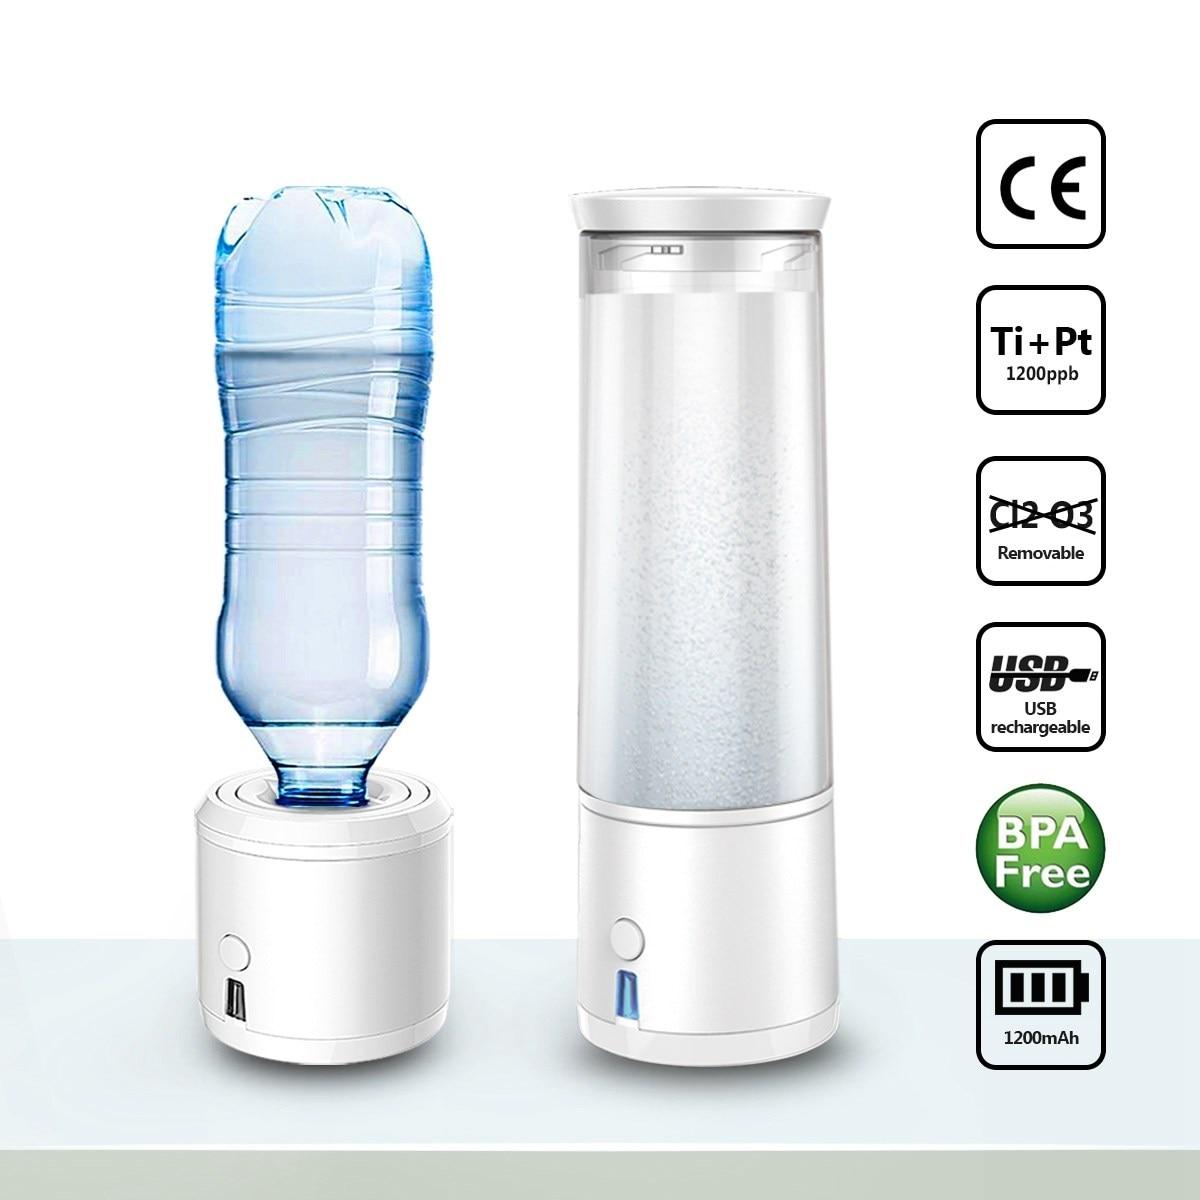 SPE H4 Hydrogen Rich Water Generator Lonizer Maker 300ml USB Charging Portable Alkaline Energy Bottle Water Filters Treatment wholesale lcd alkaline water ionizer